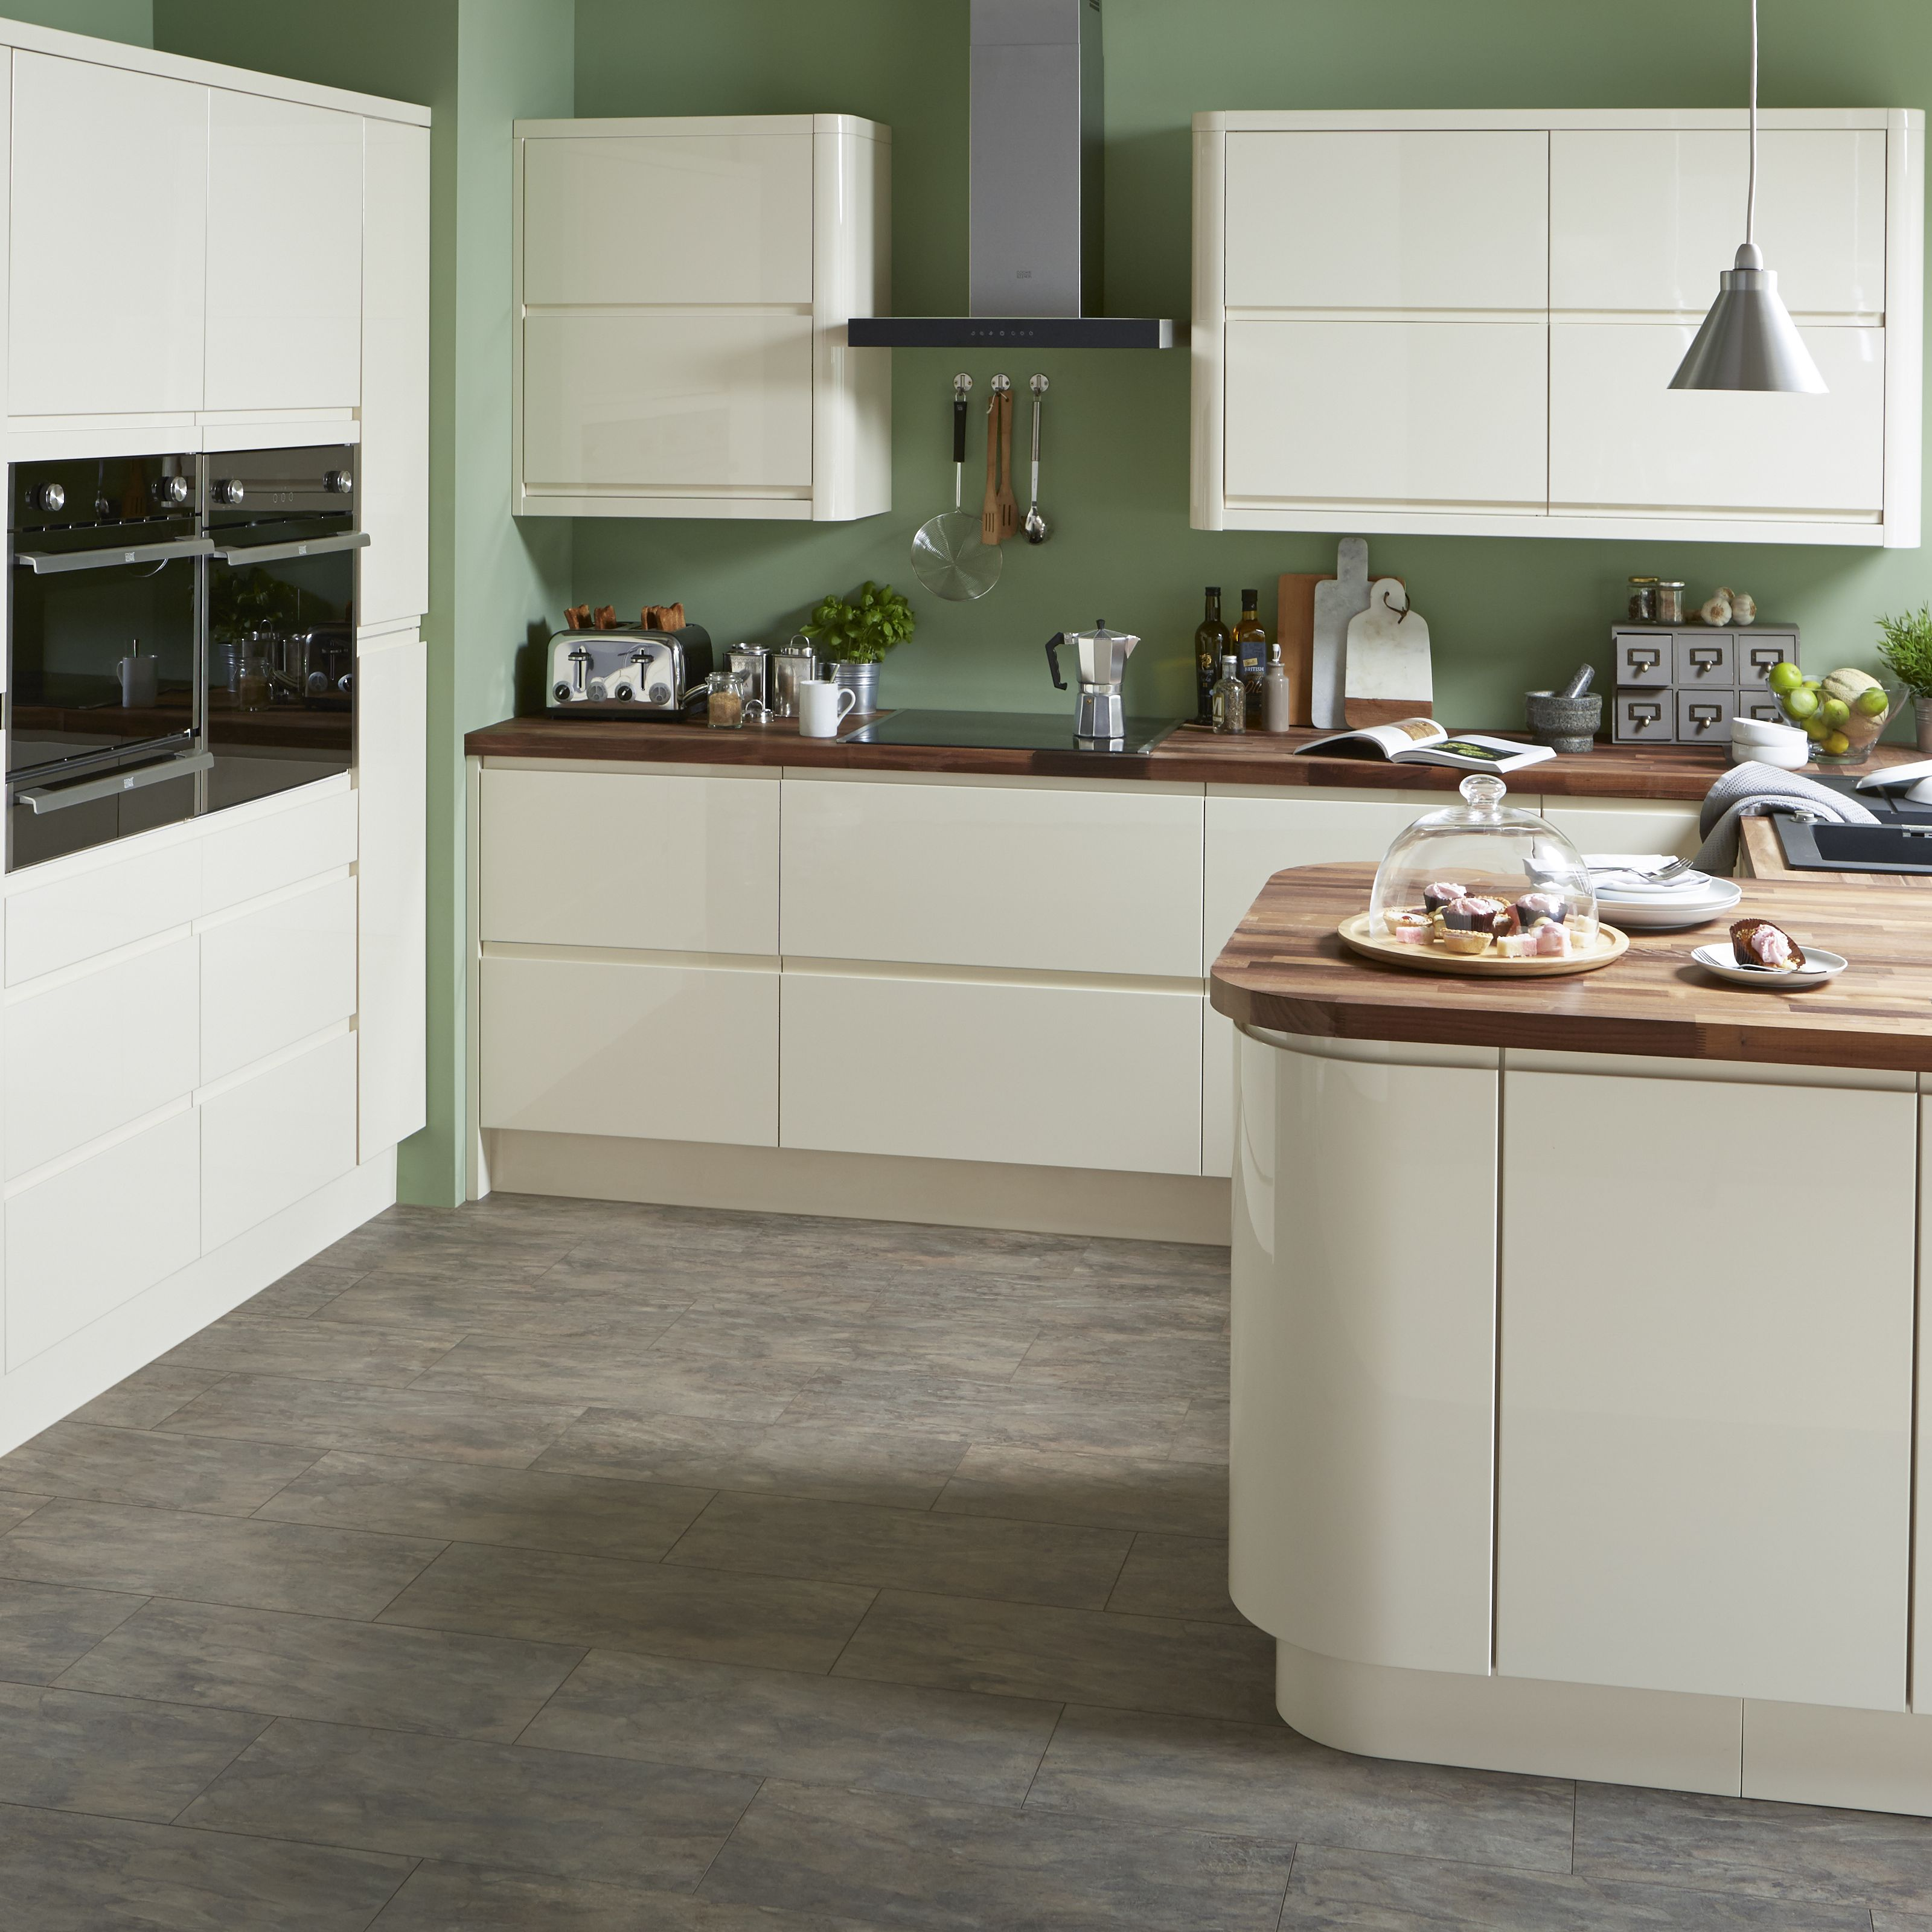 Contemporary Kitchen Remodel: Contemporary Kitchen Design Ideas